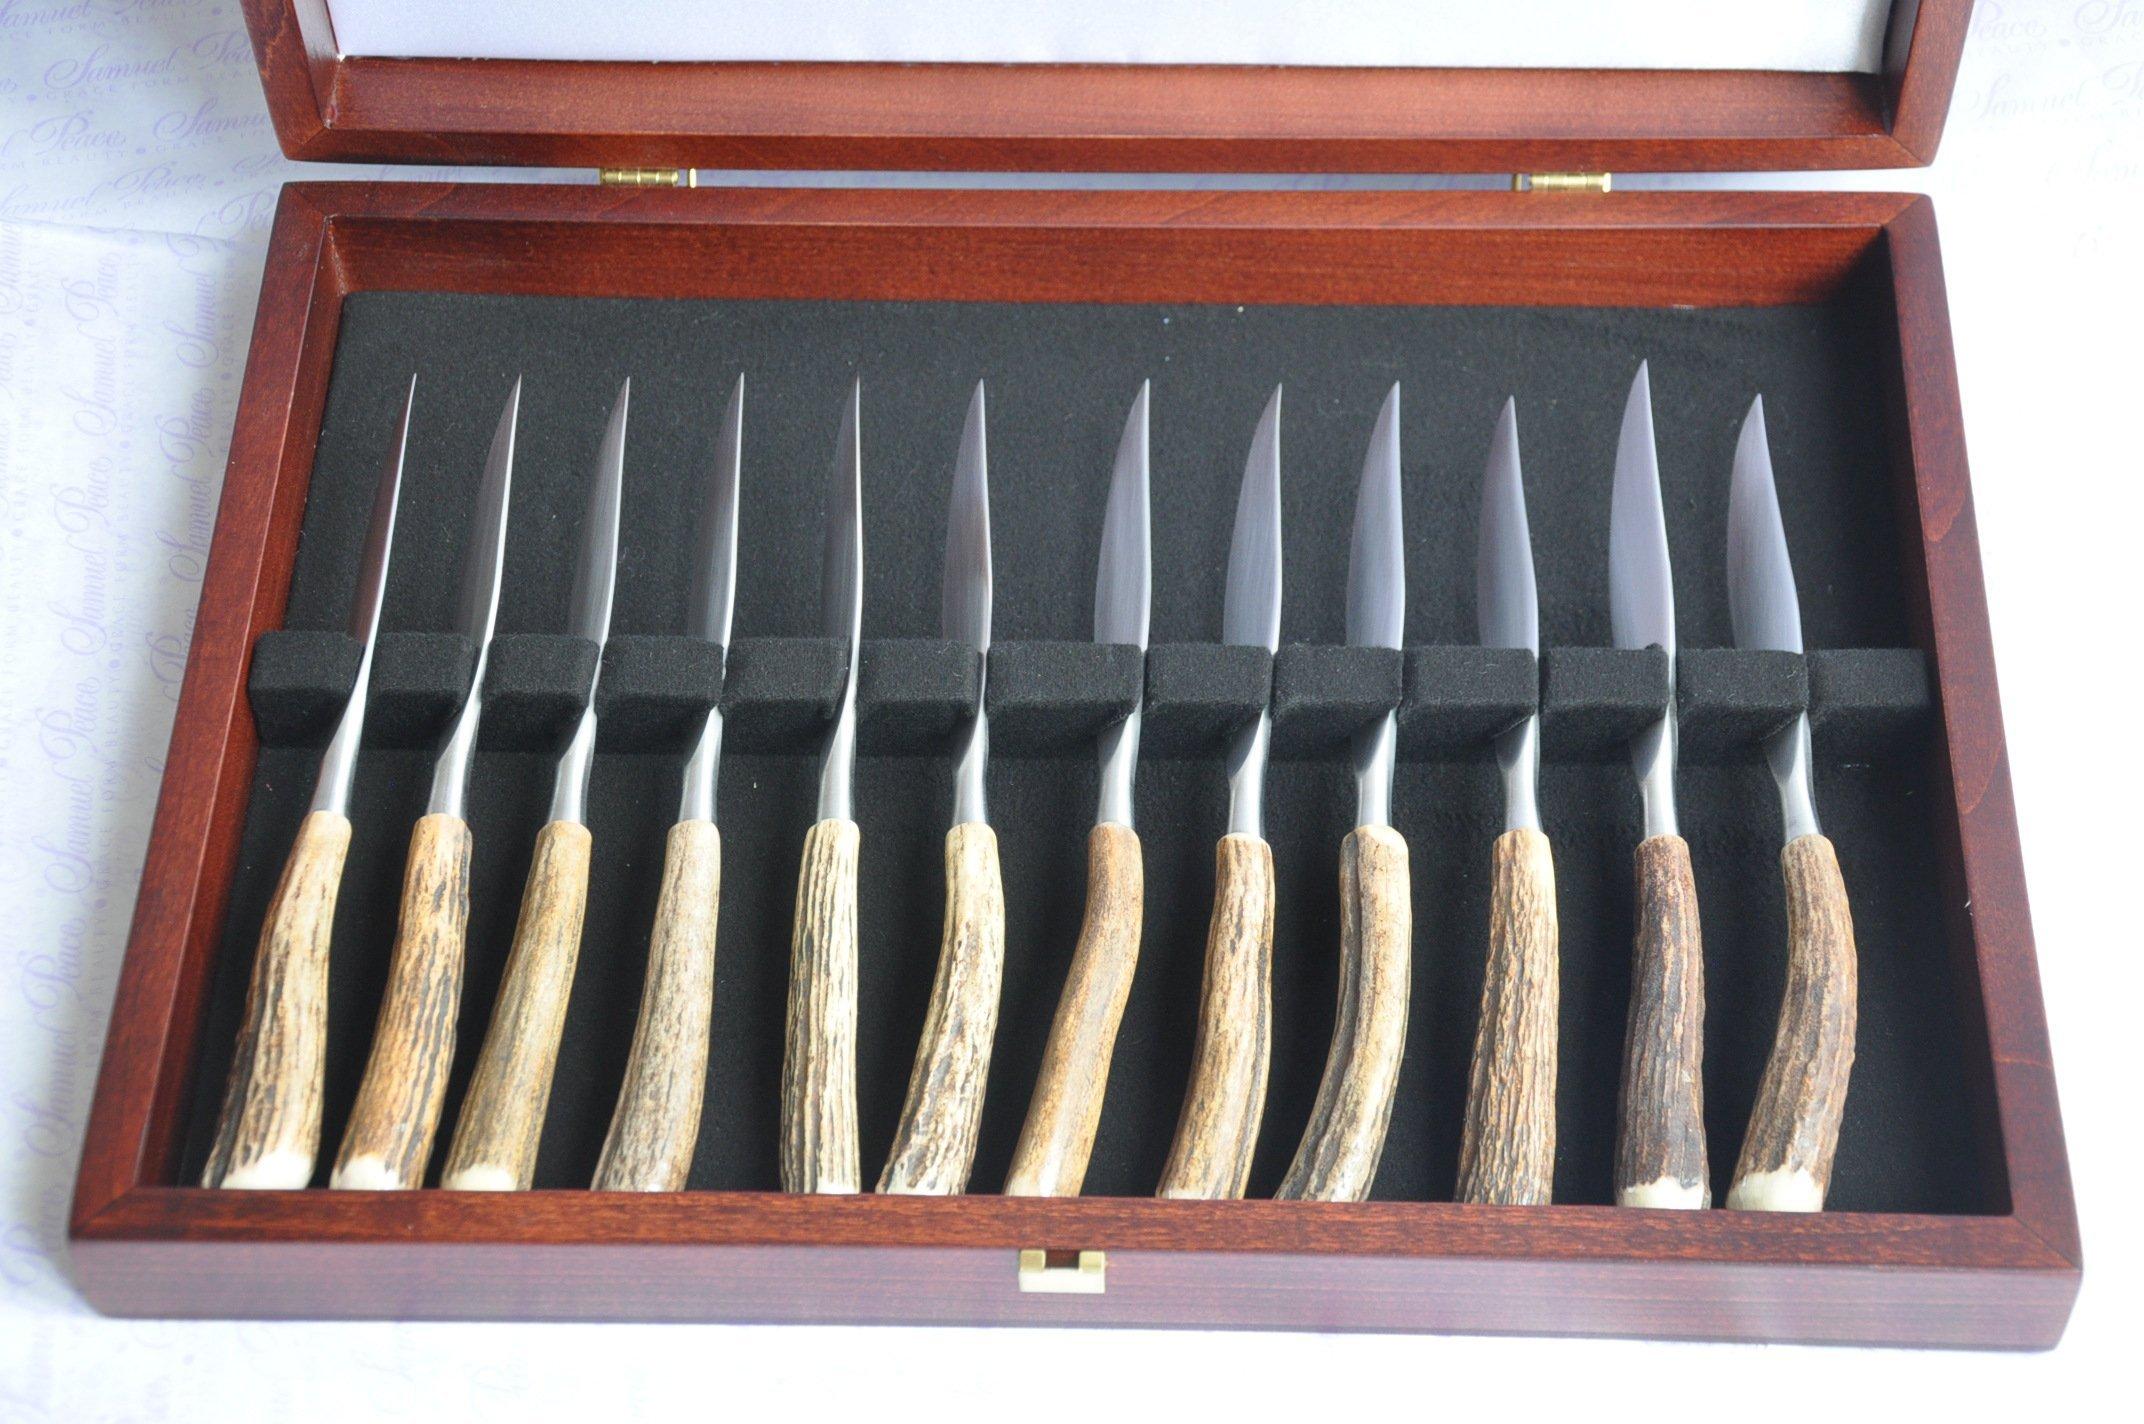 Twelve / 12 / 1 Dozen Genuine Stag/Antler Handle Steak Knives Cased Made In Sheffield England